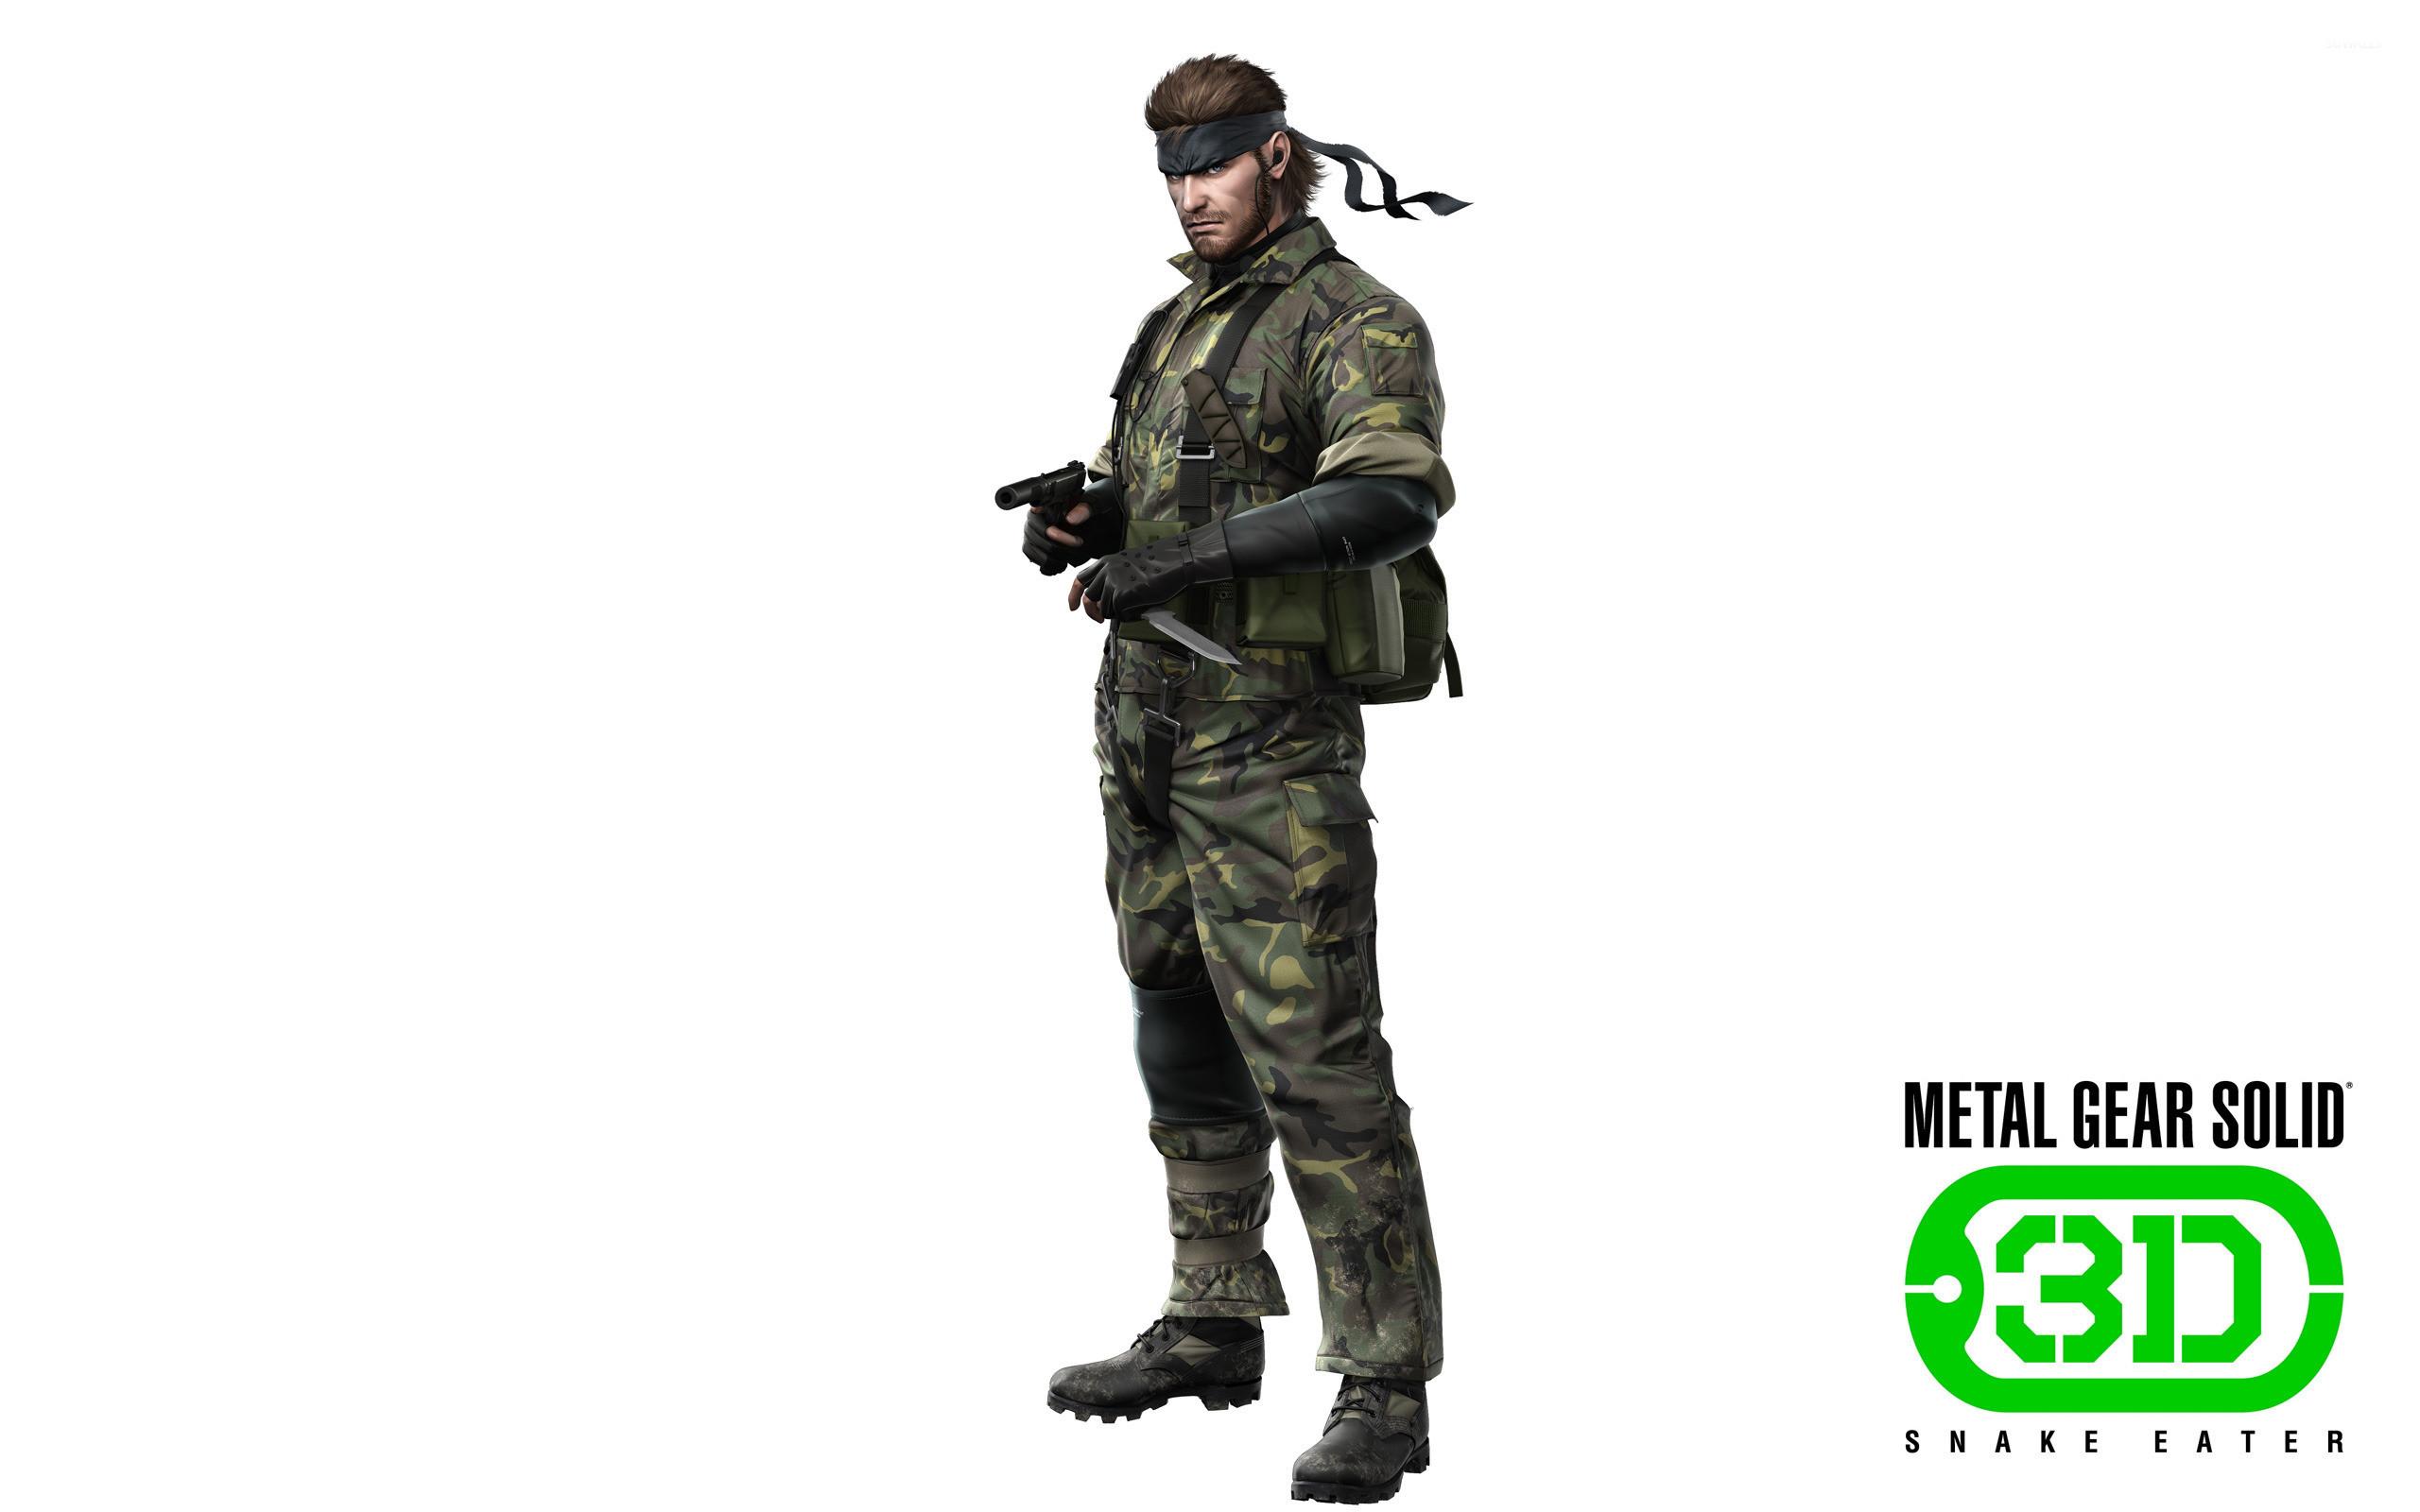 Metal Gear Solid: Snake Eater 3D [5] wallpaper jpg